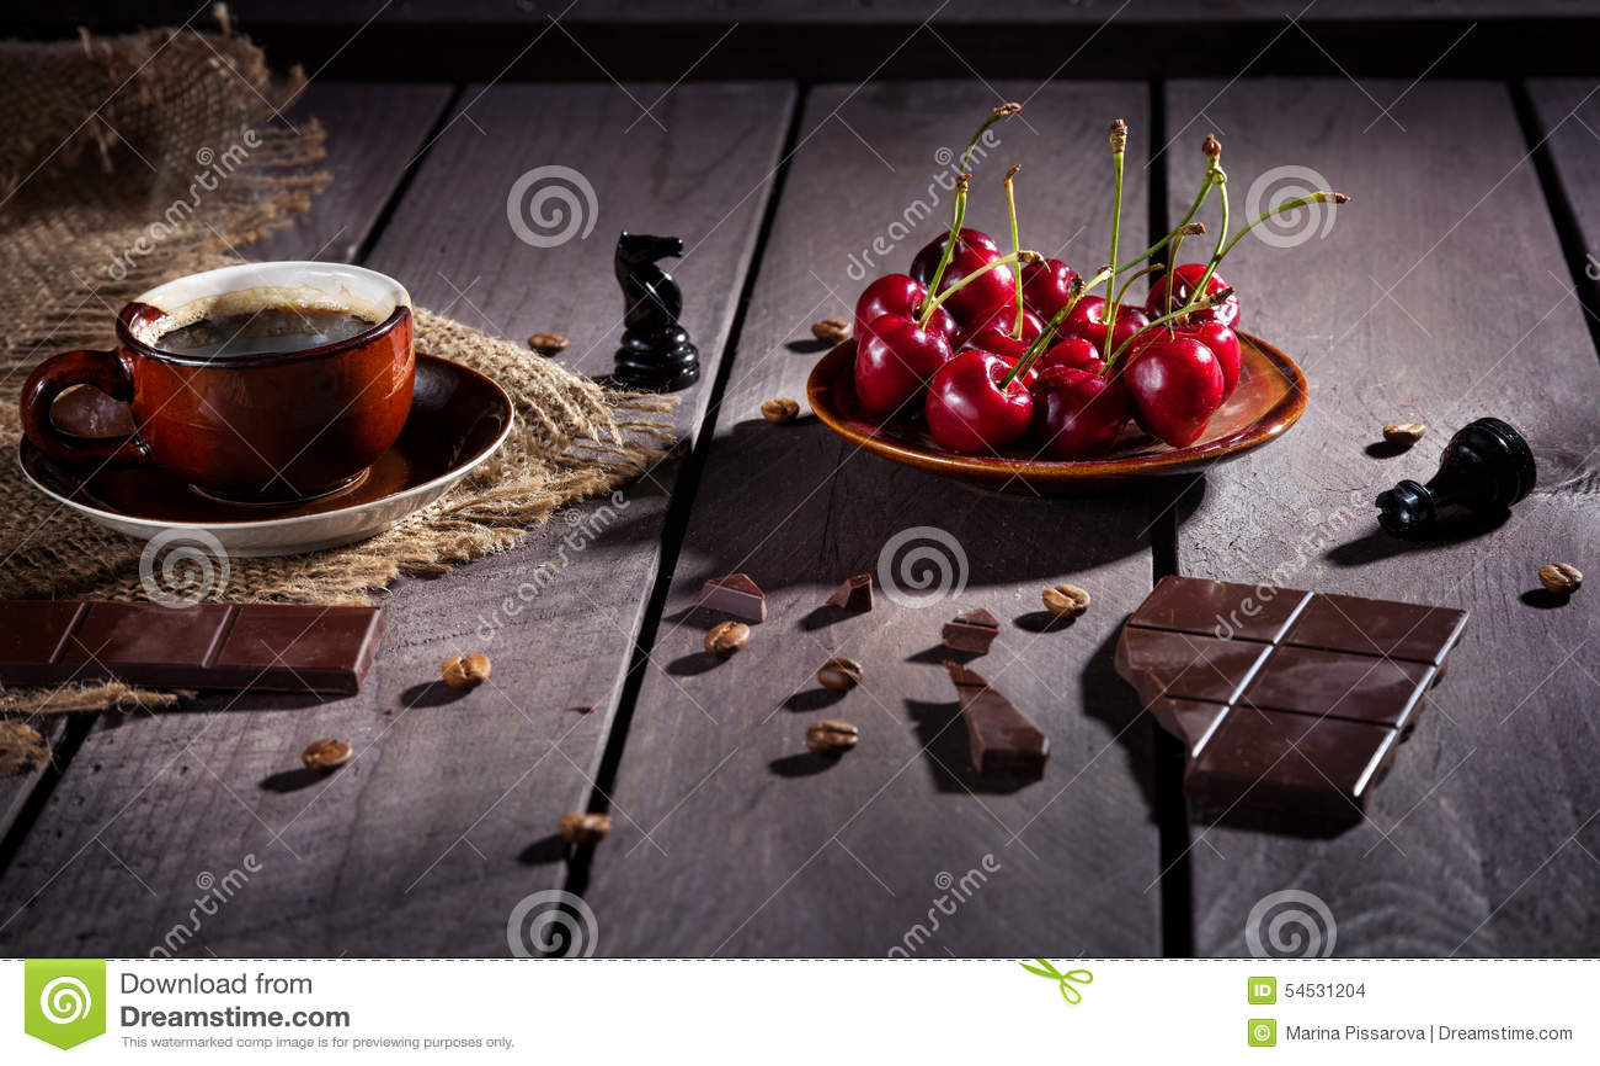 Coffee Chocolate And Cherry Stock Photo Image 54531204